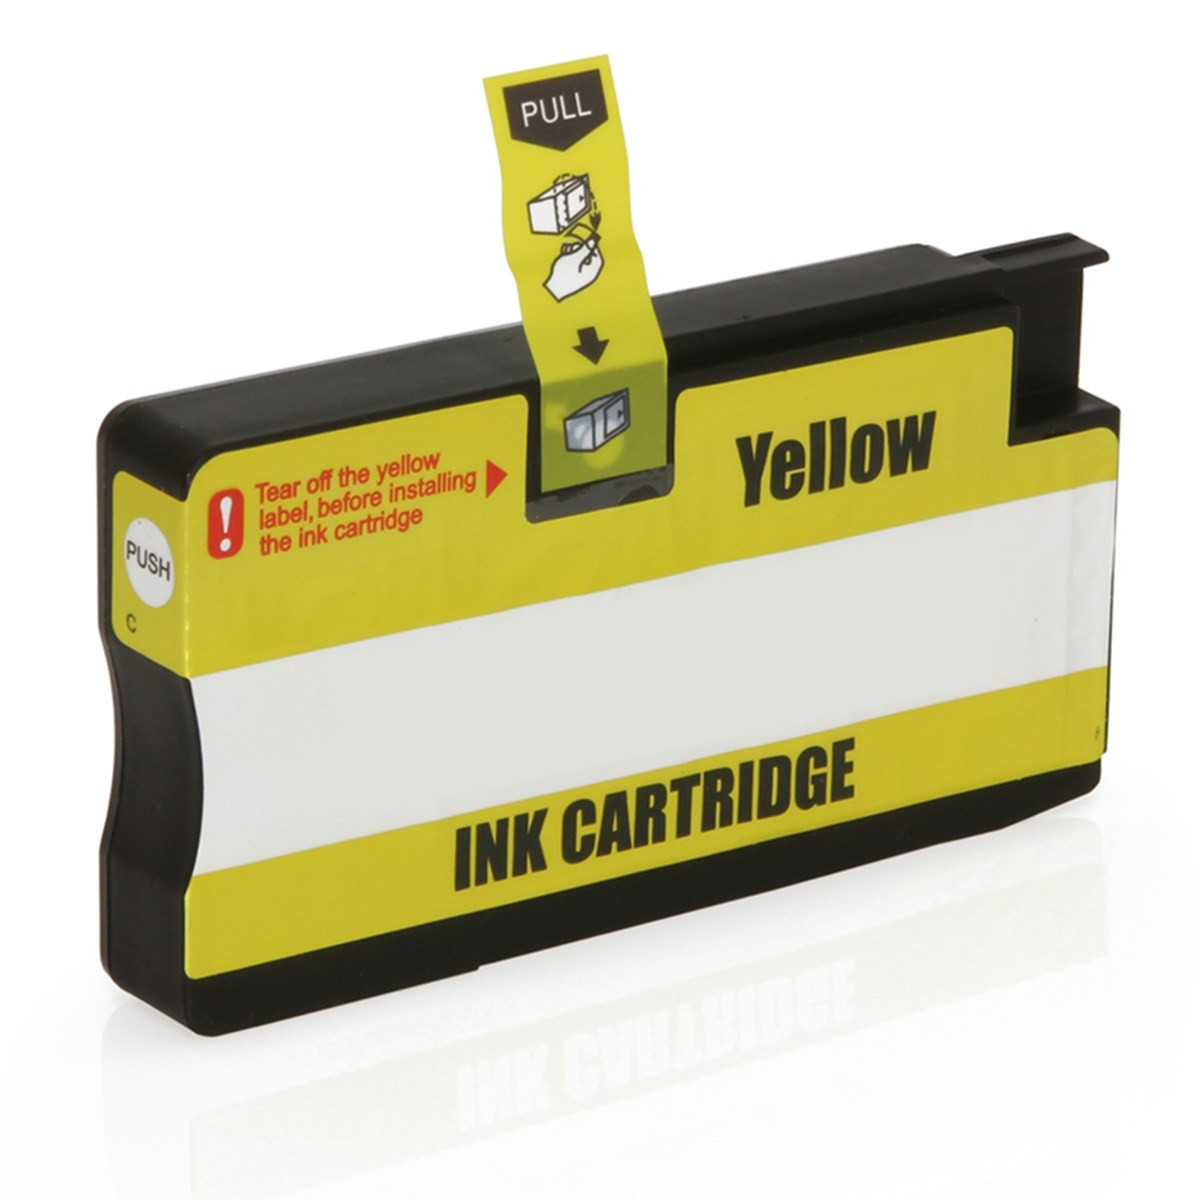 Cartucho de Tinta Compatível com HP 954XL L0S68AB Amarelo | 7730 7740 8210 8710 8720 | 26ml